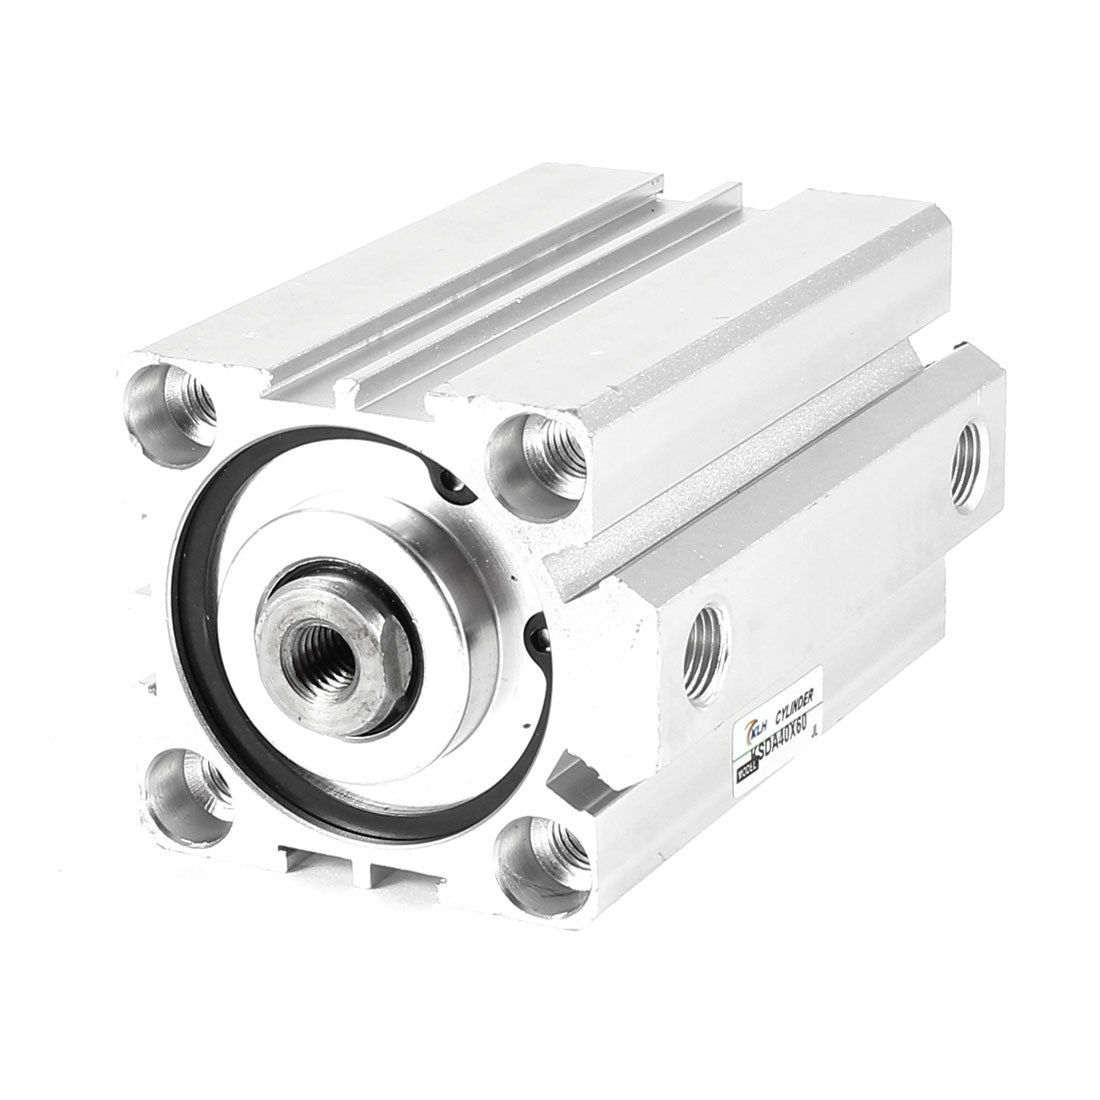 1 Pcs 63mm Bore 35mm Stroke Stainless steel Pneumatic Air Cylinder SDA63-35 1 pcs 32mm bore 75mm stroke stainless steel pneumatic air cylinder m32x75